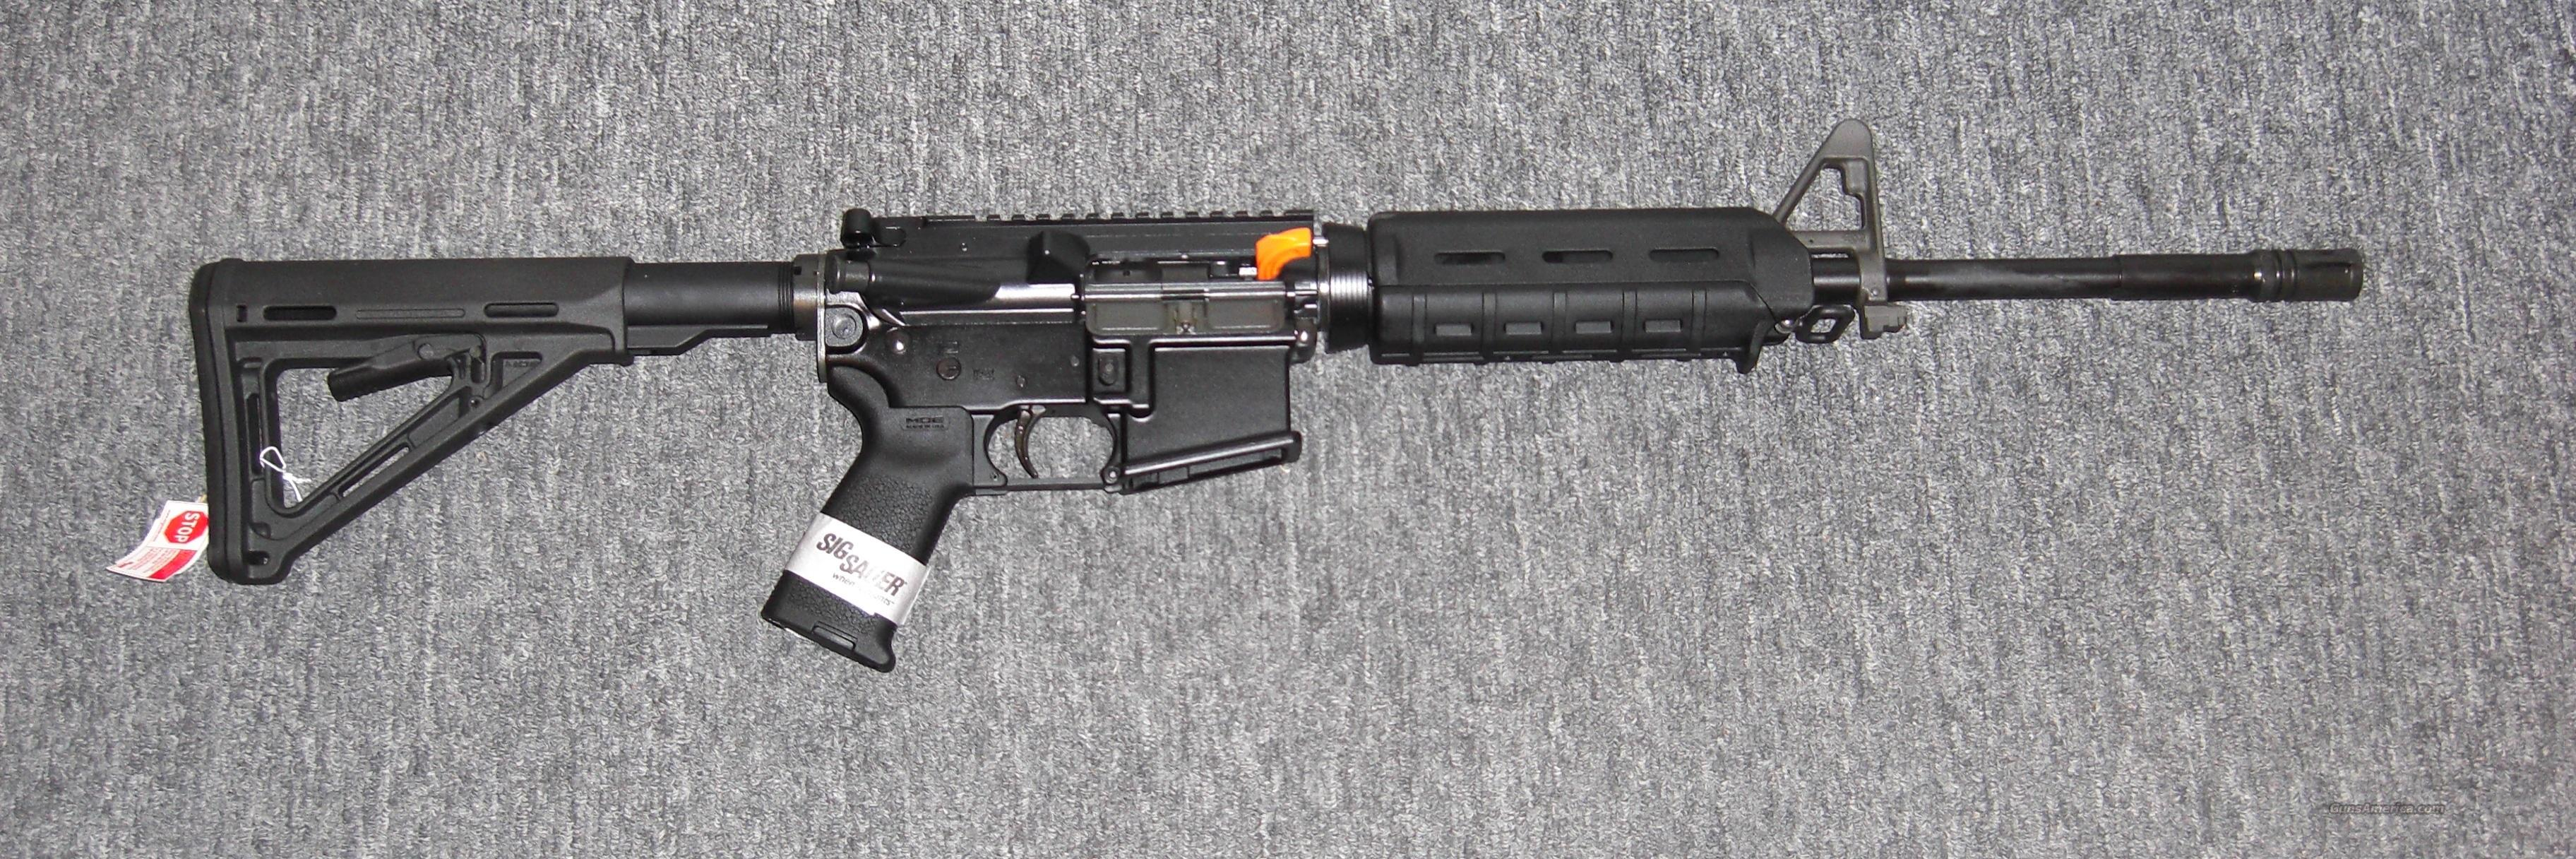 m wblack moe furniture (rmbecp) for sale - m wblack moe furniture (rmbecp) guns  rifles